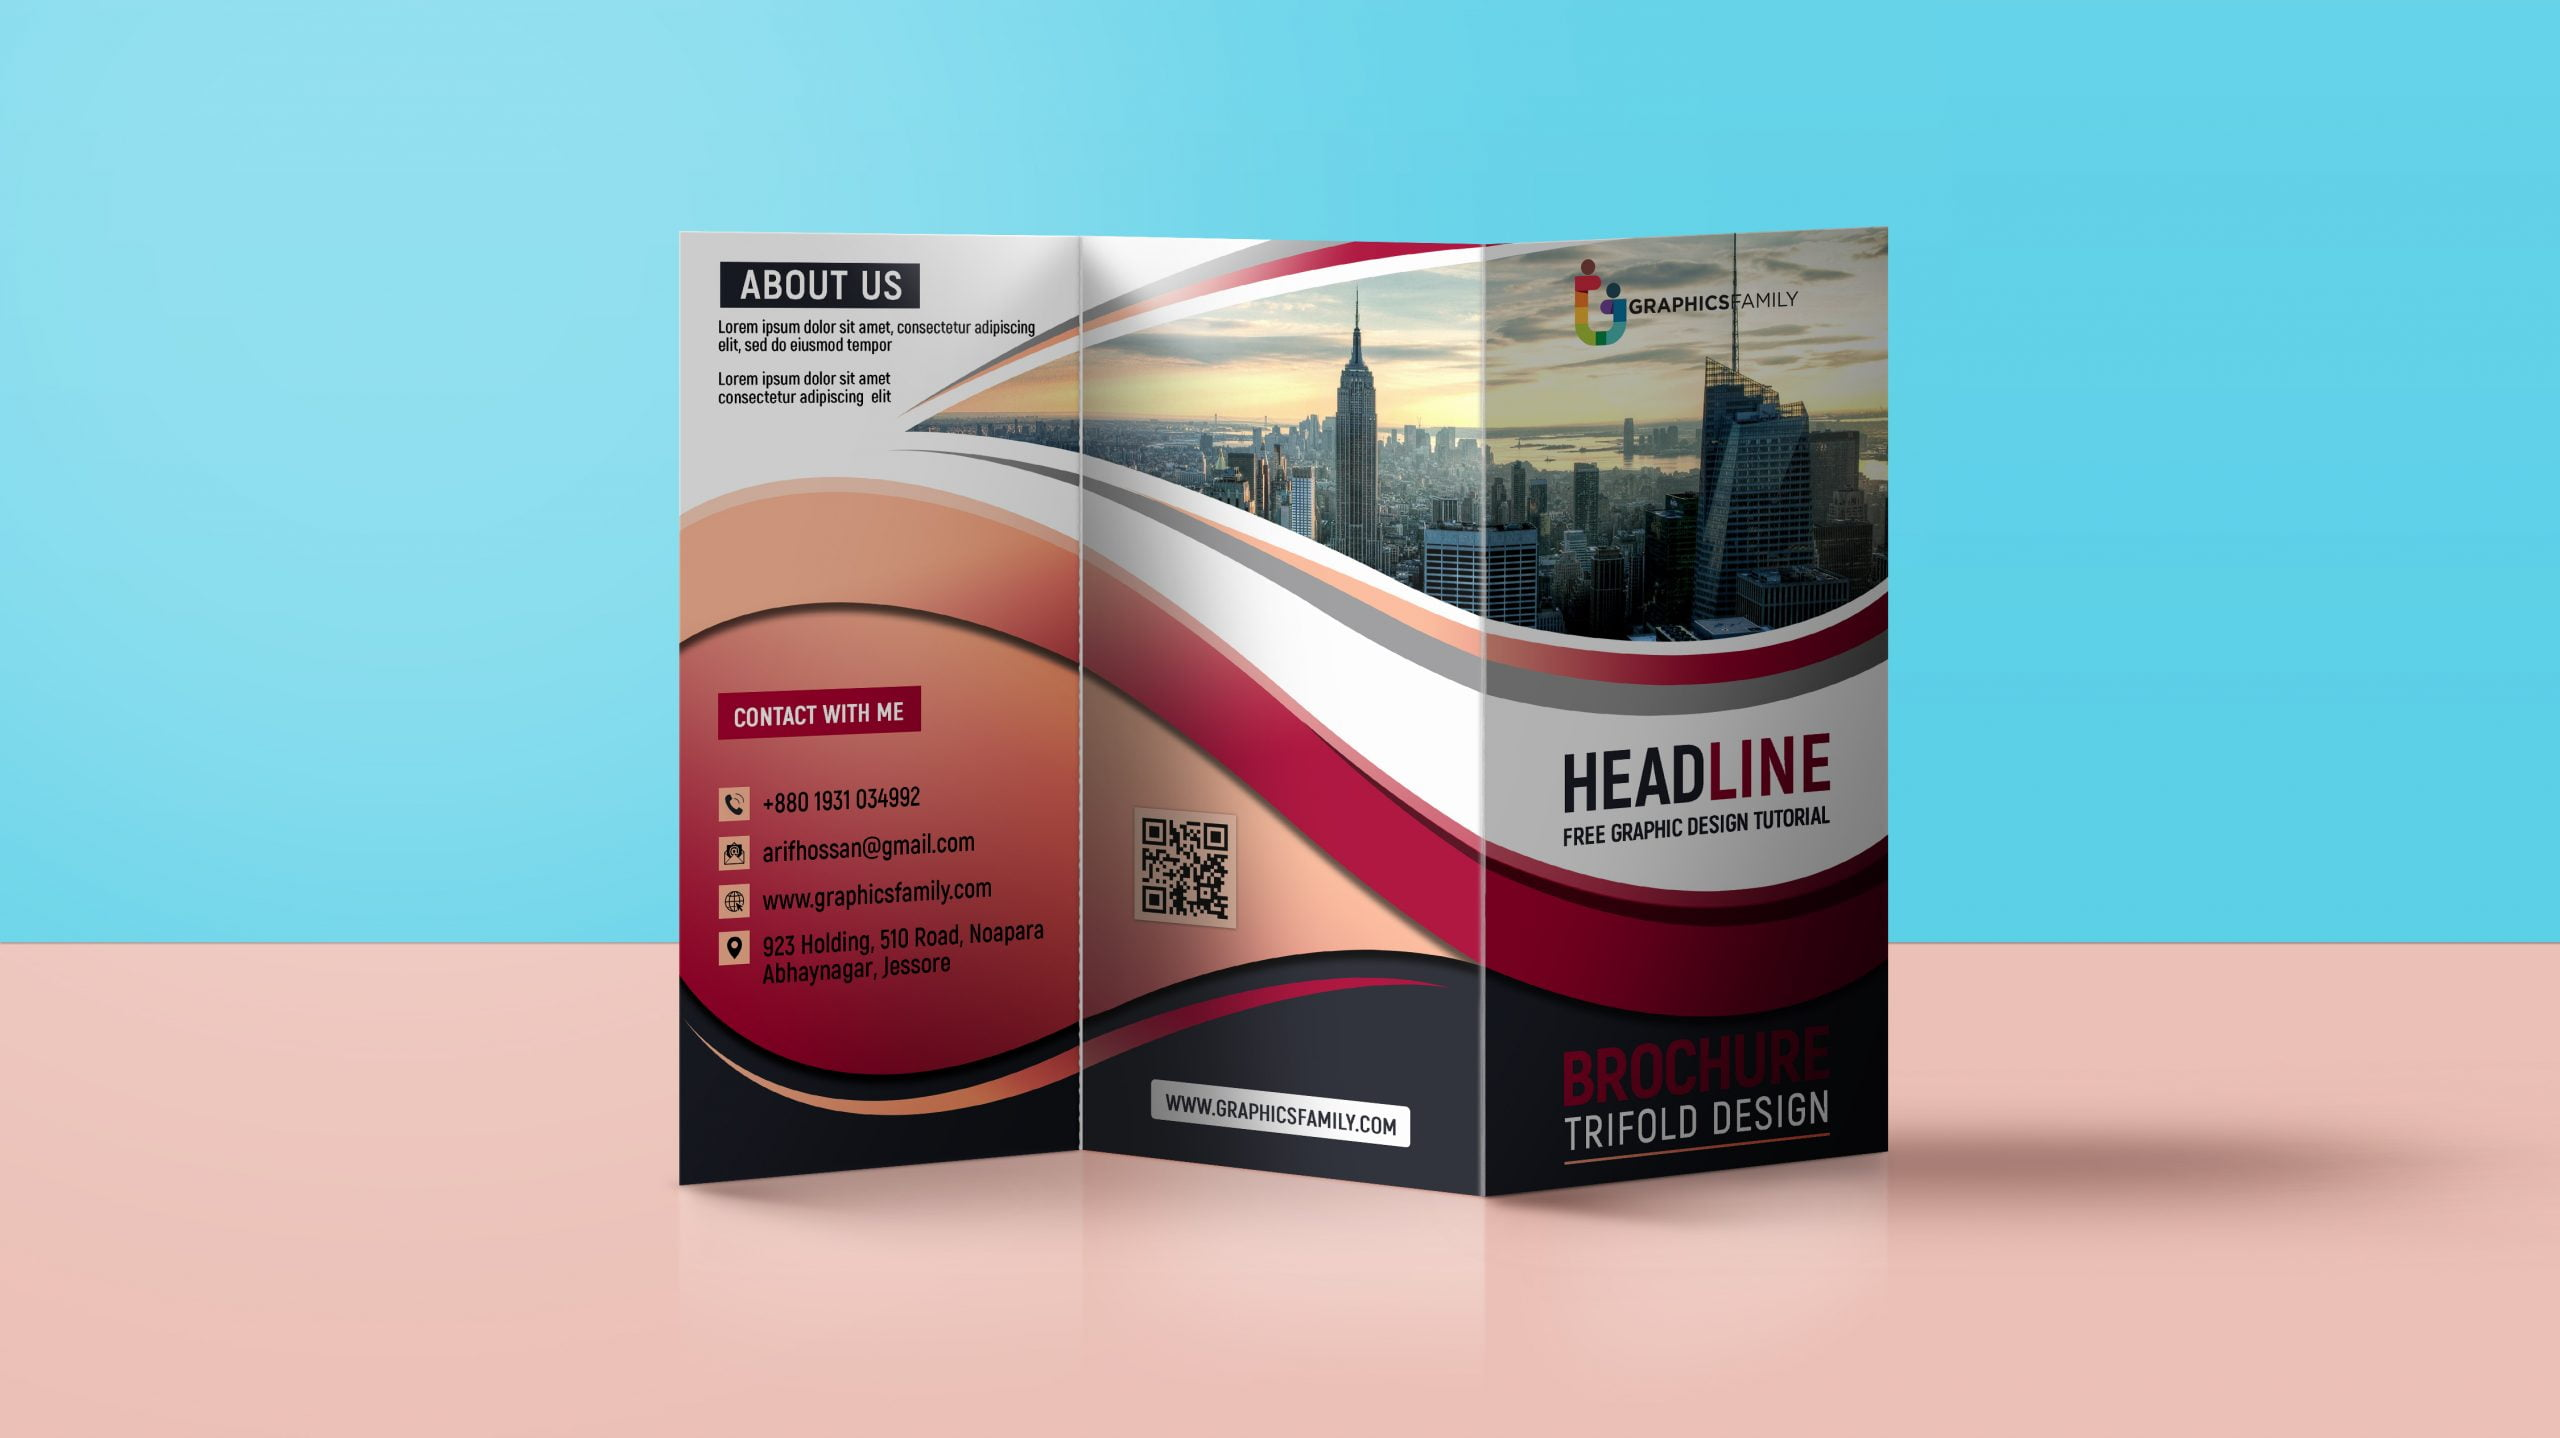 Trifold Brochure Design For Business Promotion